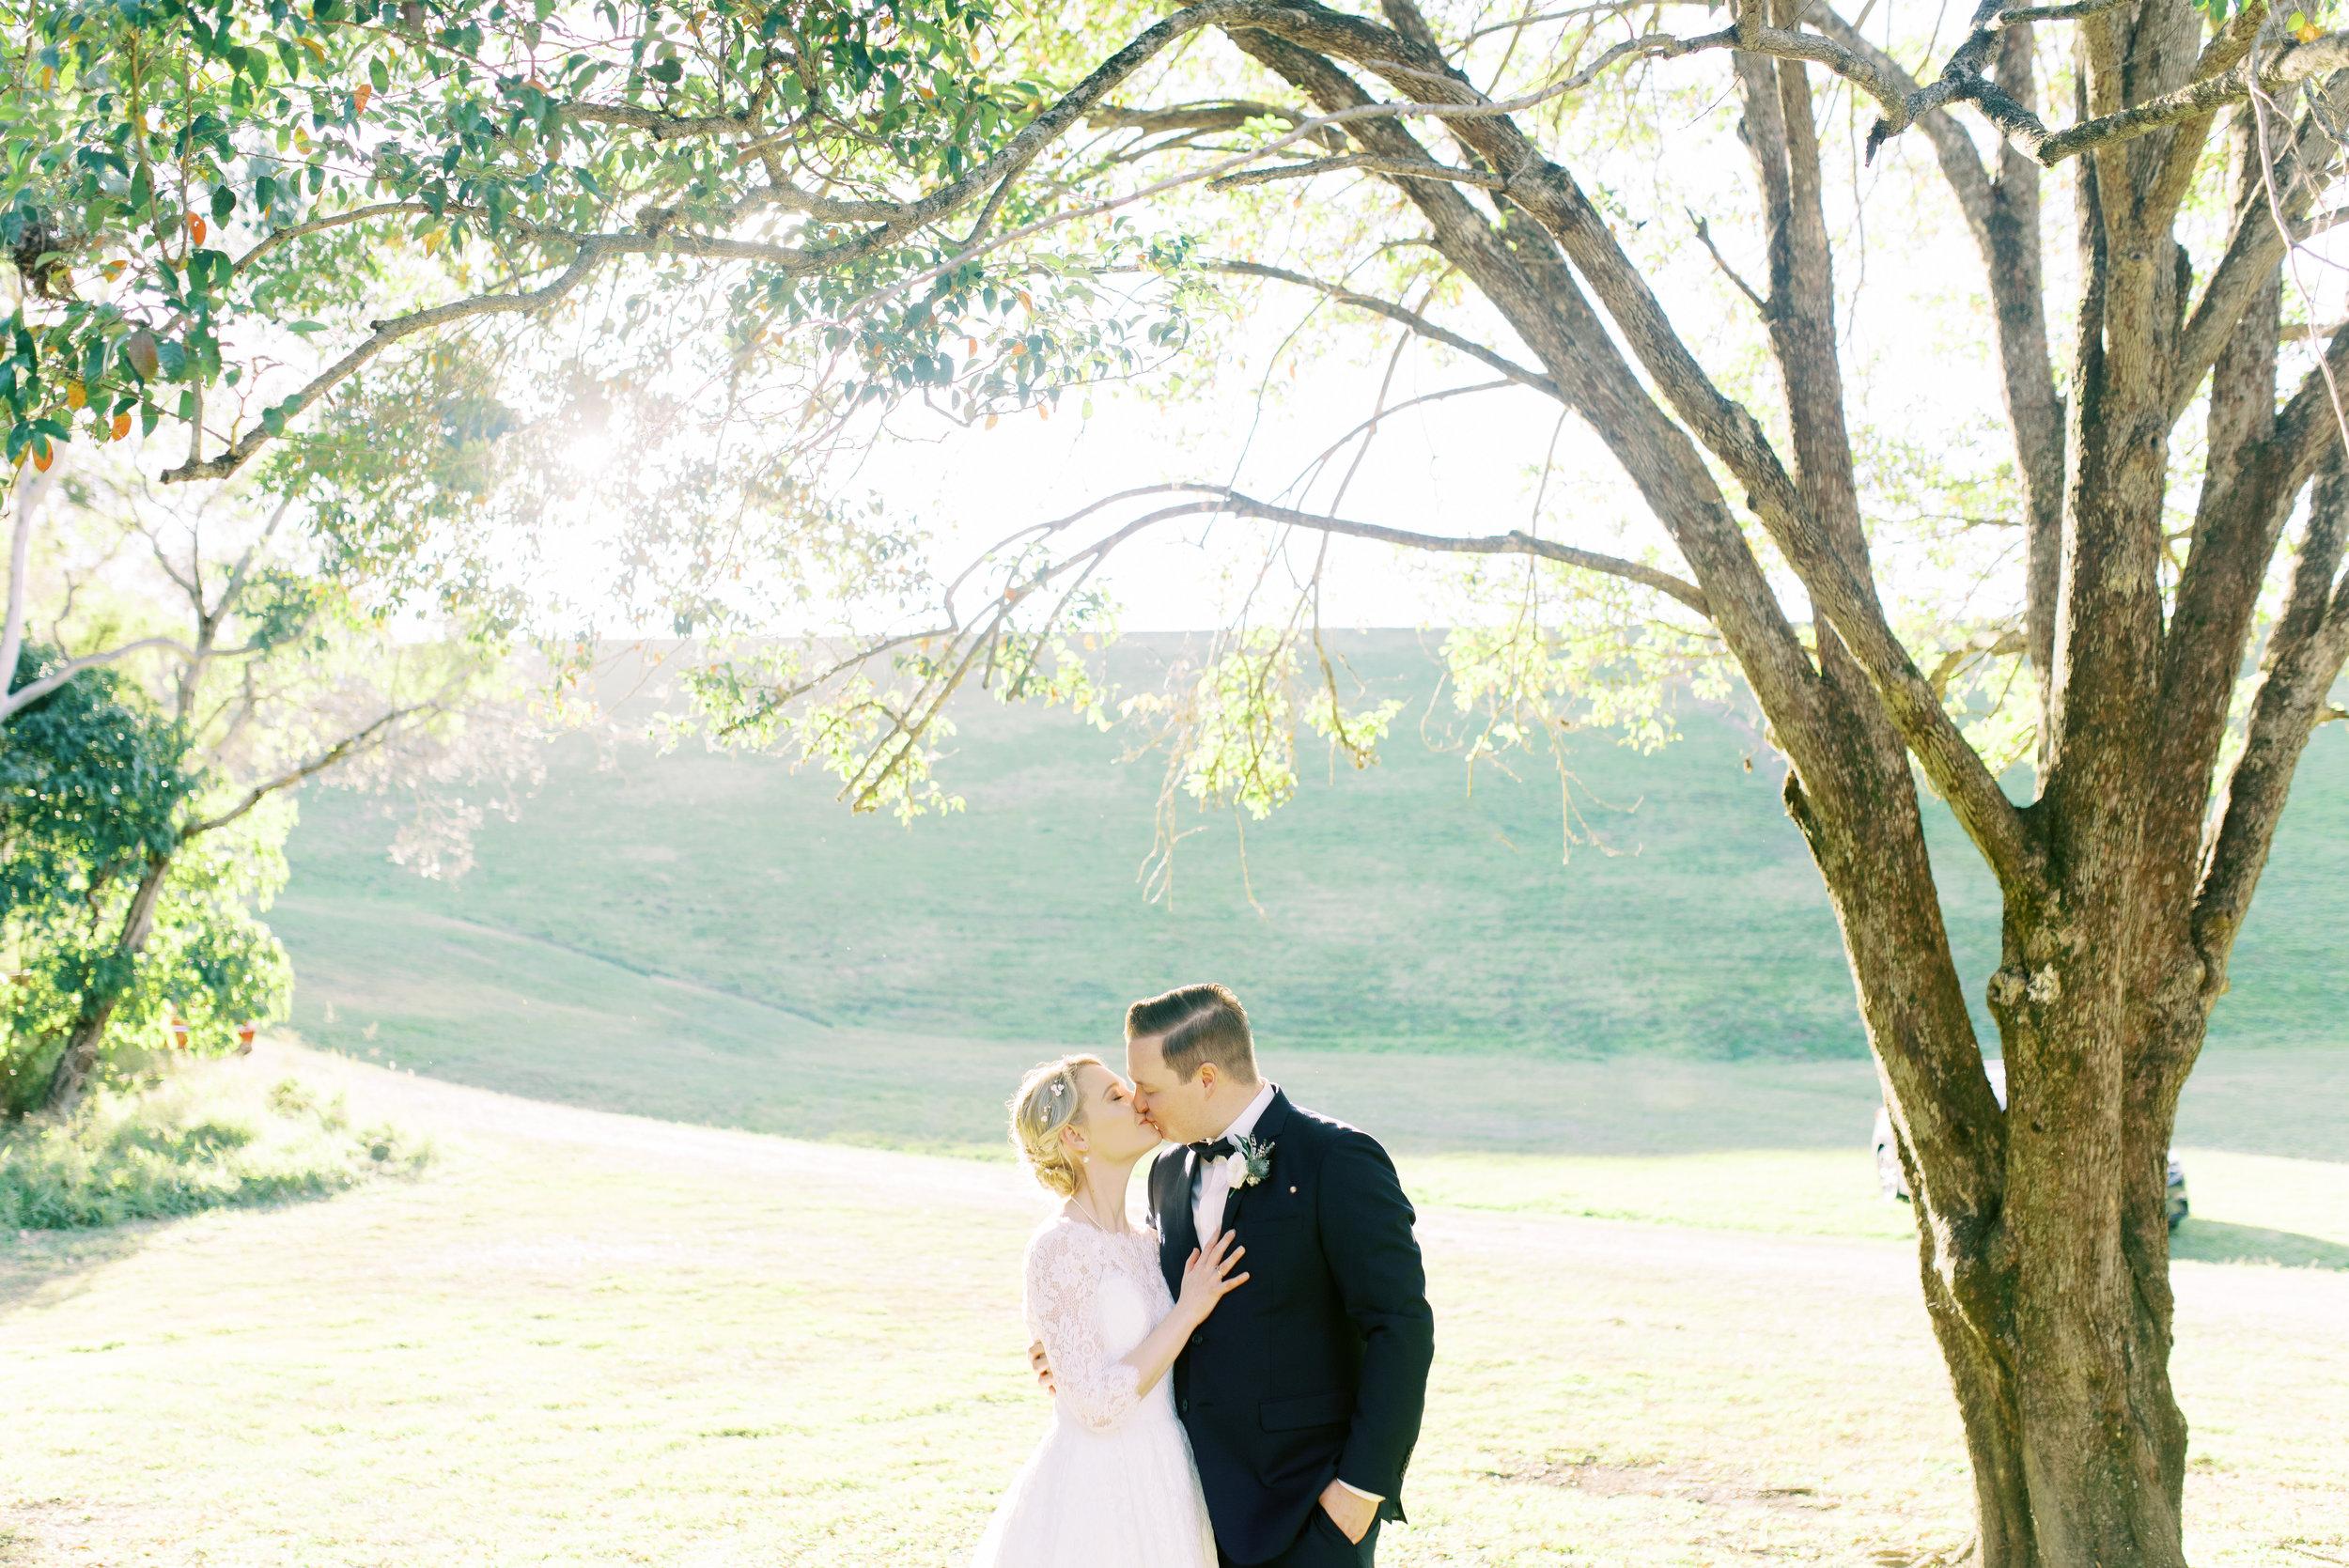 brisbane-gold-coast-sunshine-coast-tweed-romantic-fine-art-wedding-photography-lauren-olivia-40.jpg